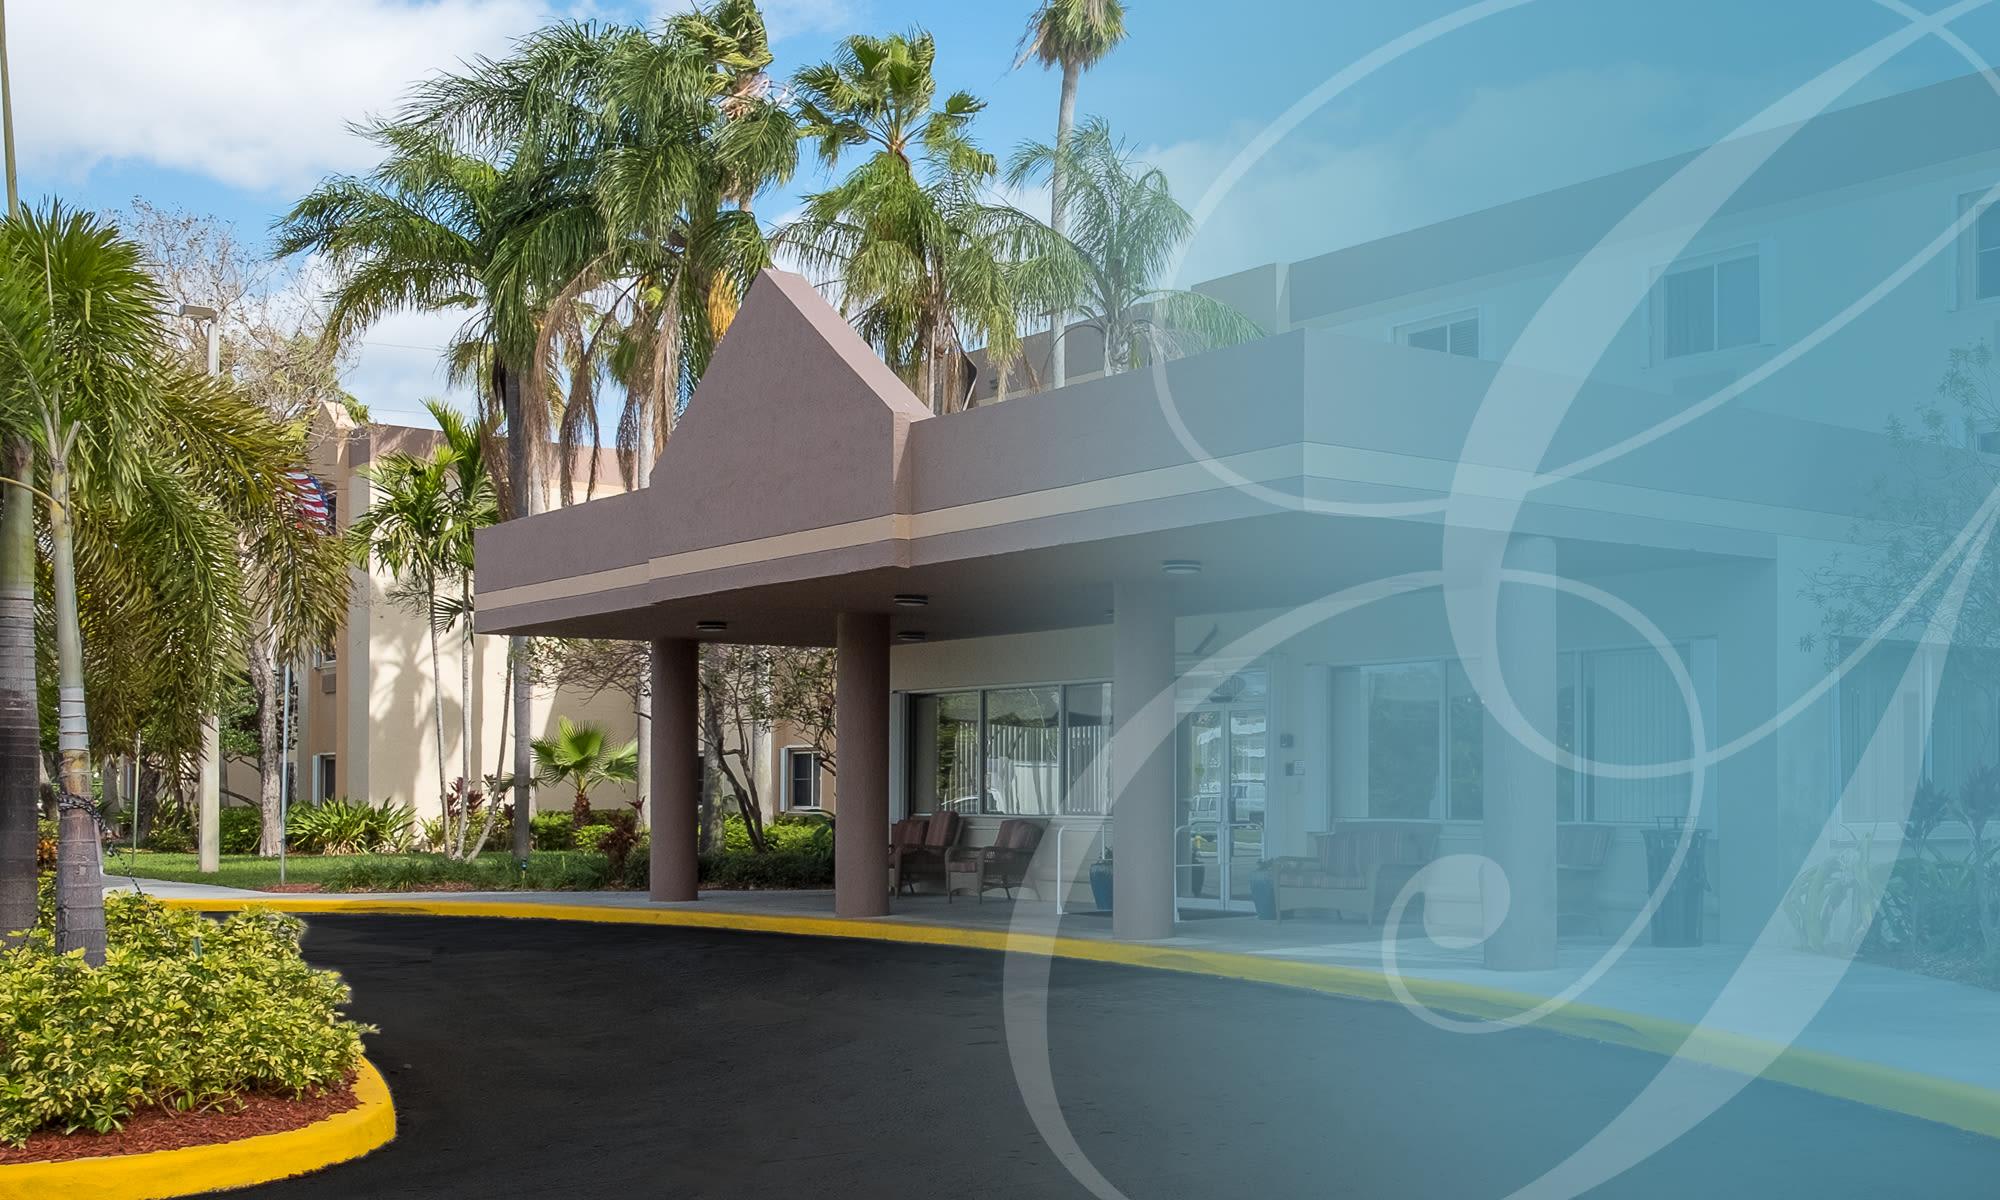 Entrance/Foyer at Grand Villa of Deerfield Beach in Deerfield Beach, Florida